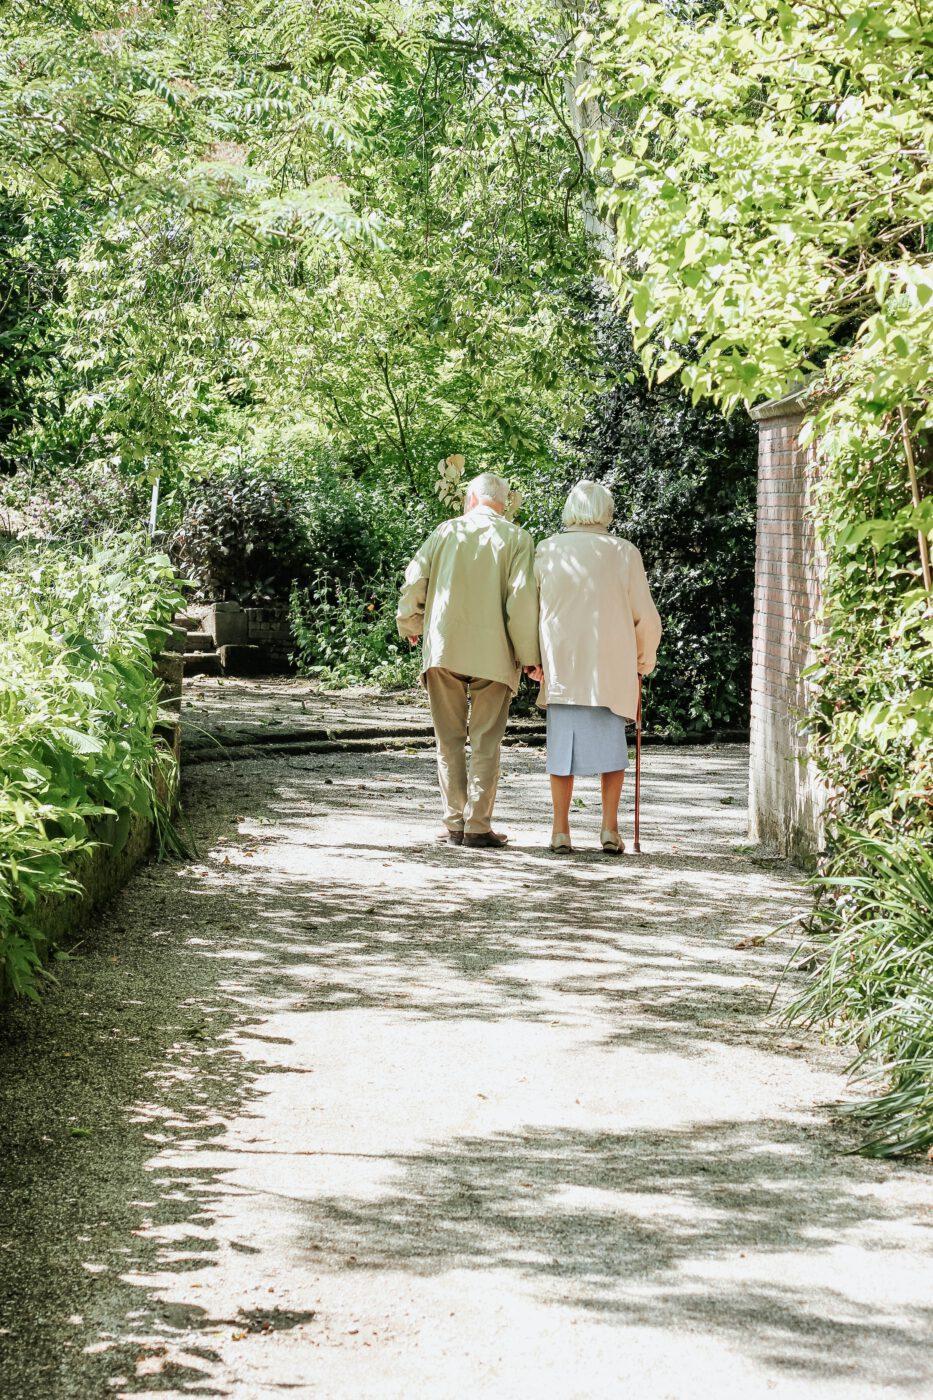 elderly people walking italy